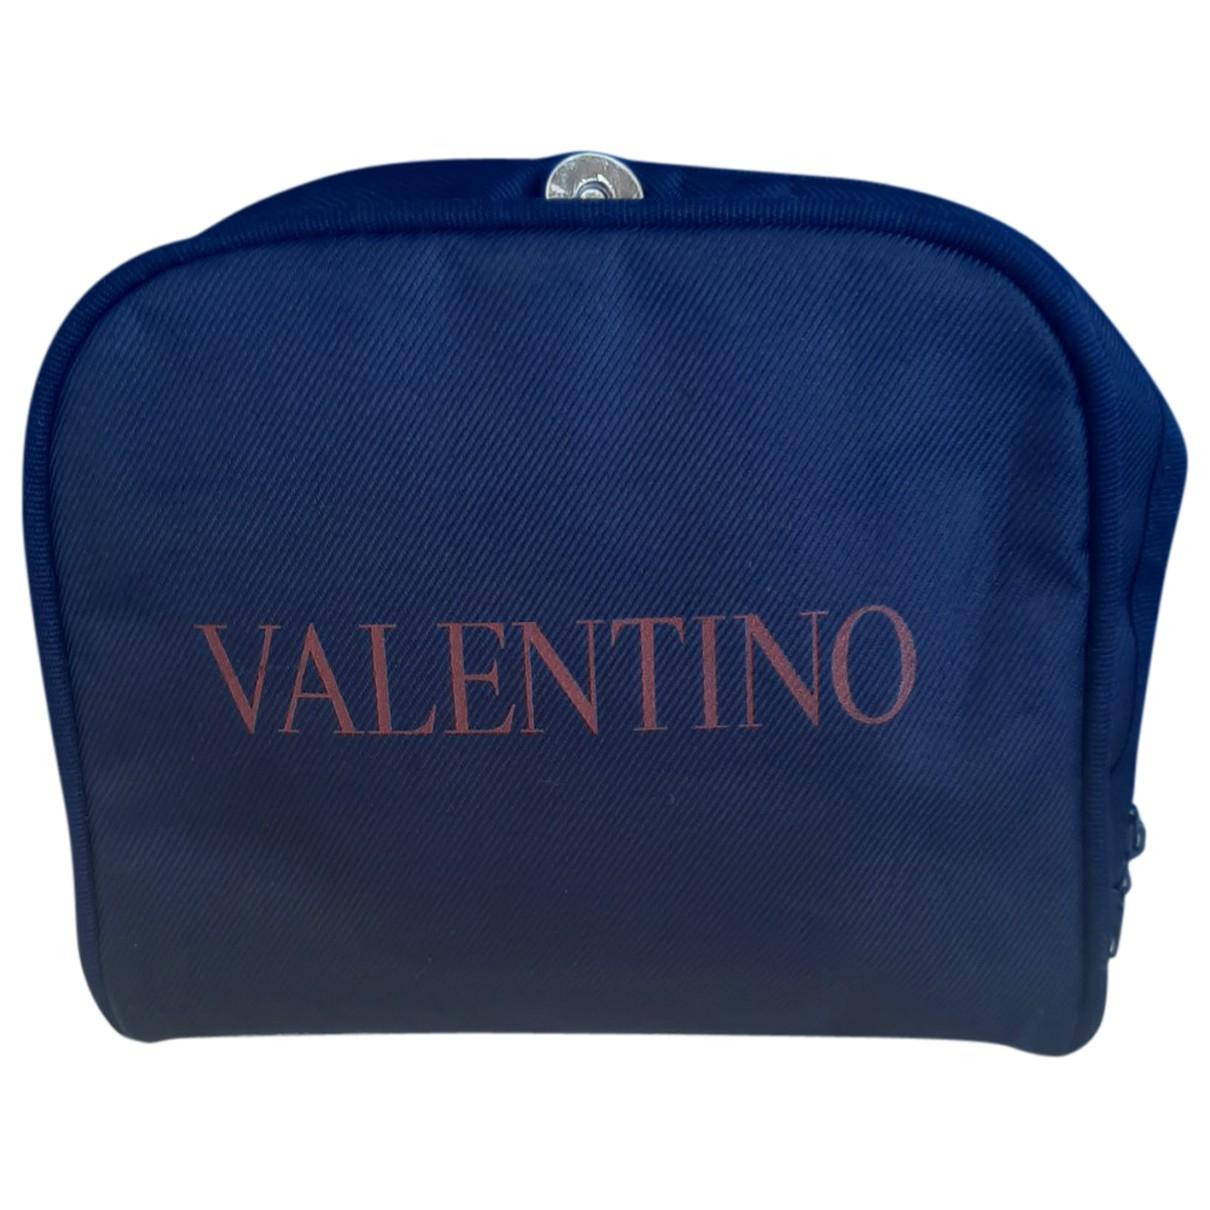 Valentino Garavani - Sac de voyage   pour femme en toile - marine